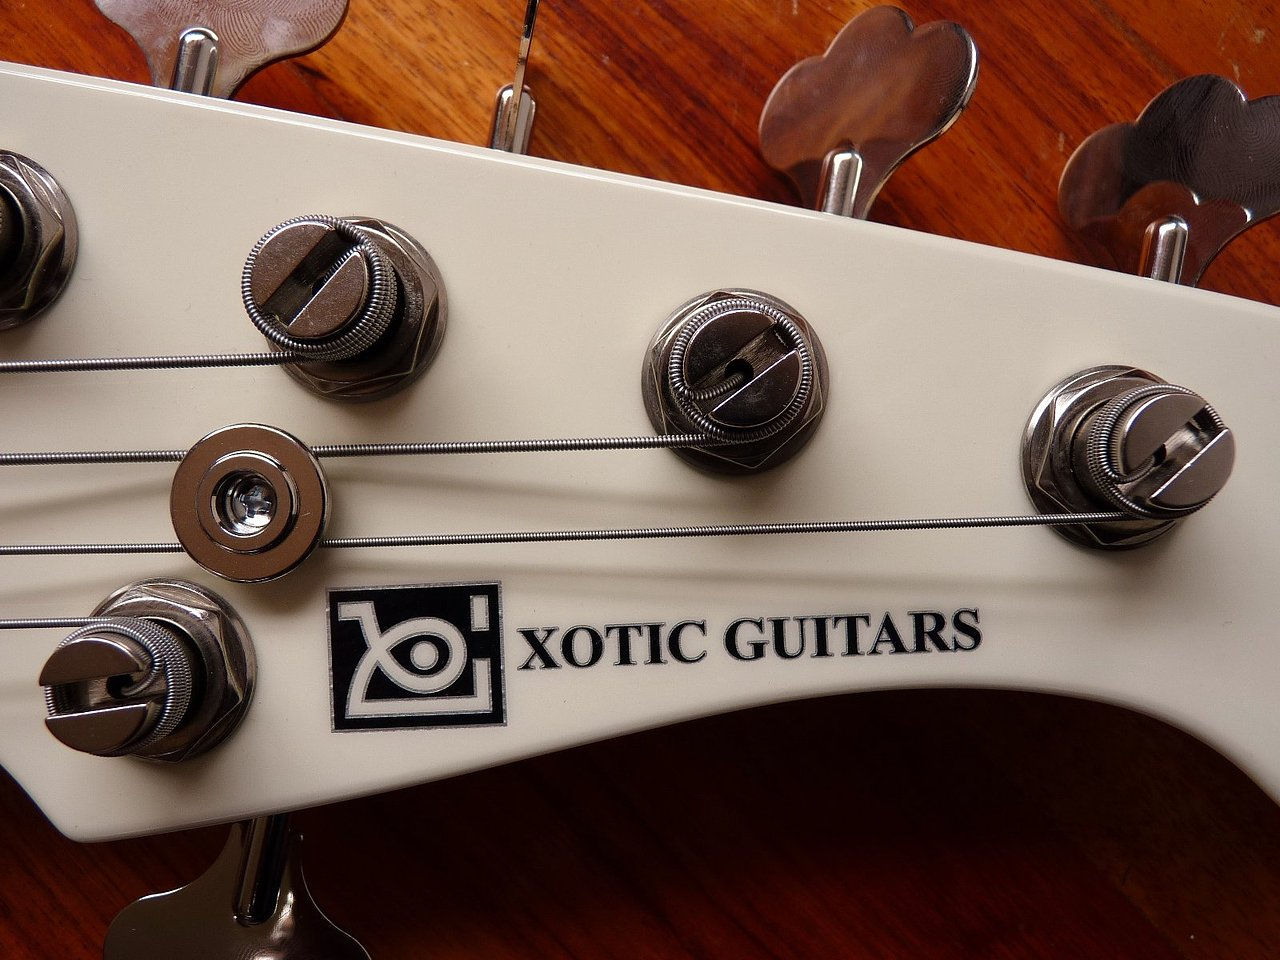 XOTIC GUITARS